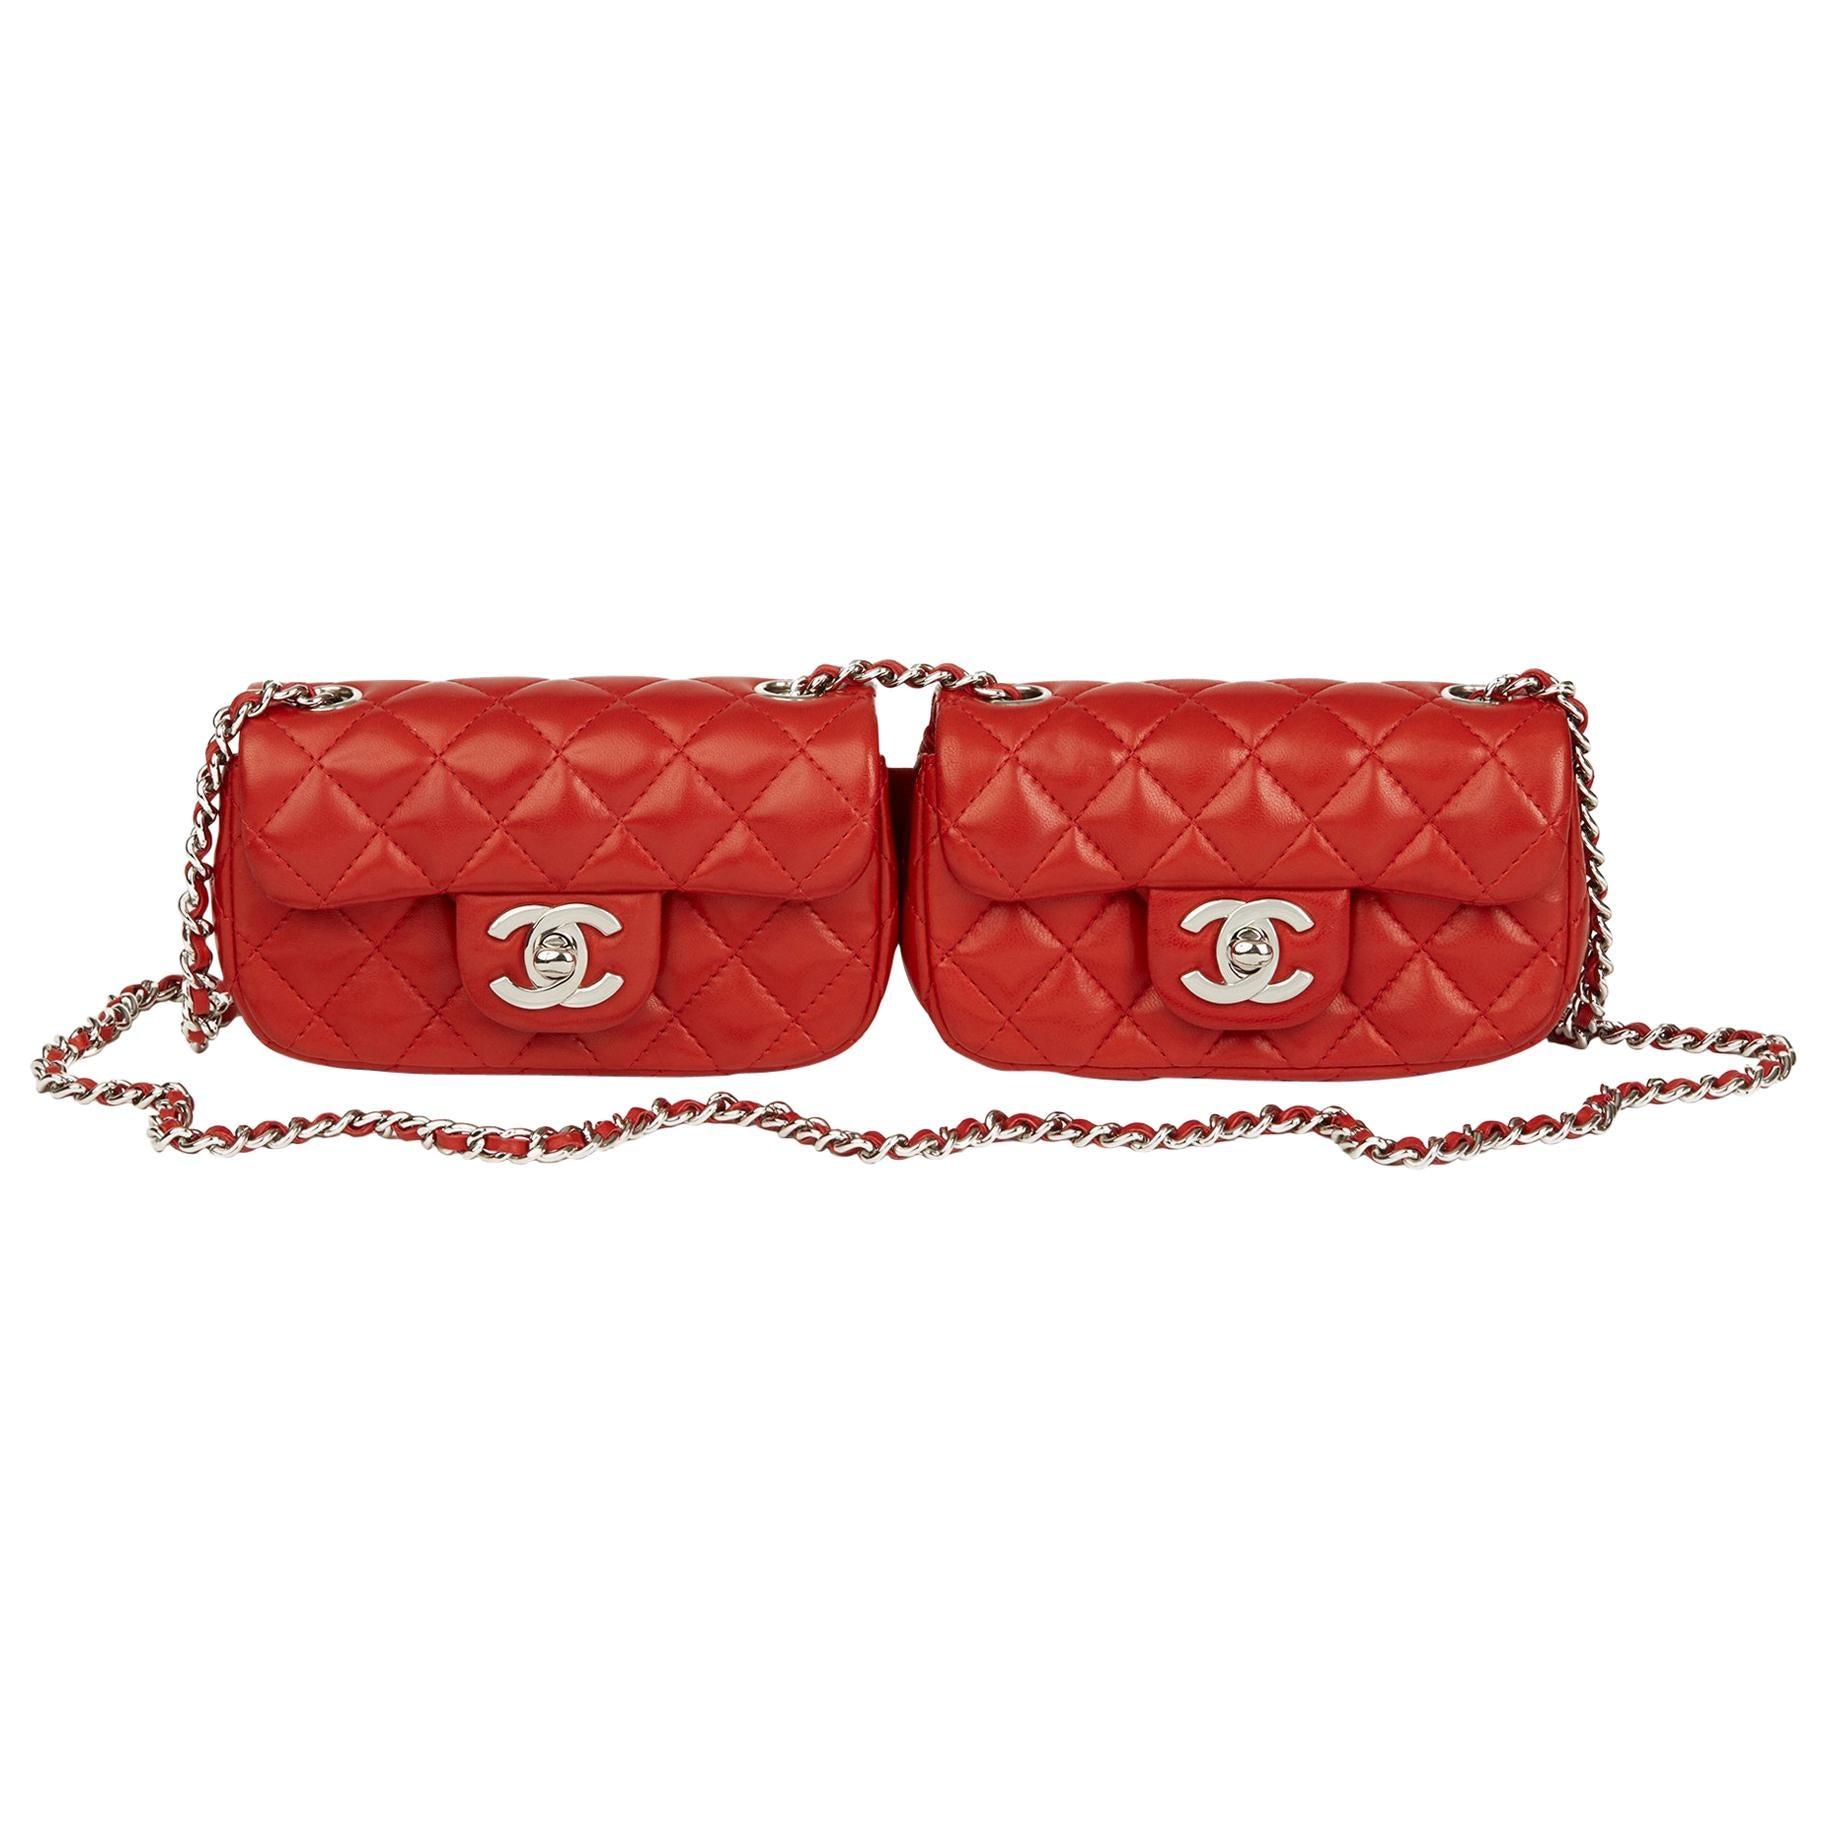 5f6b77efbdb3 Vintage Handbags and Purses For Sale in England - 1stdibs